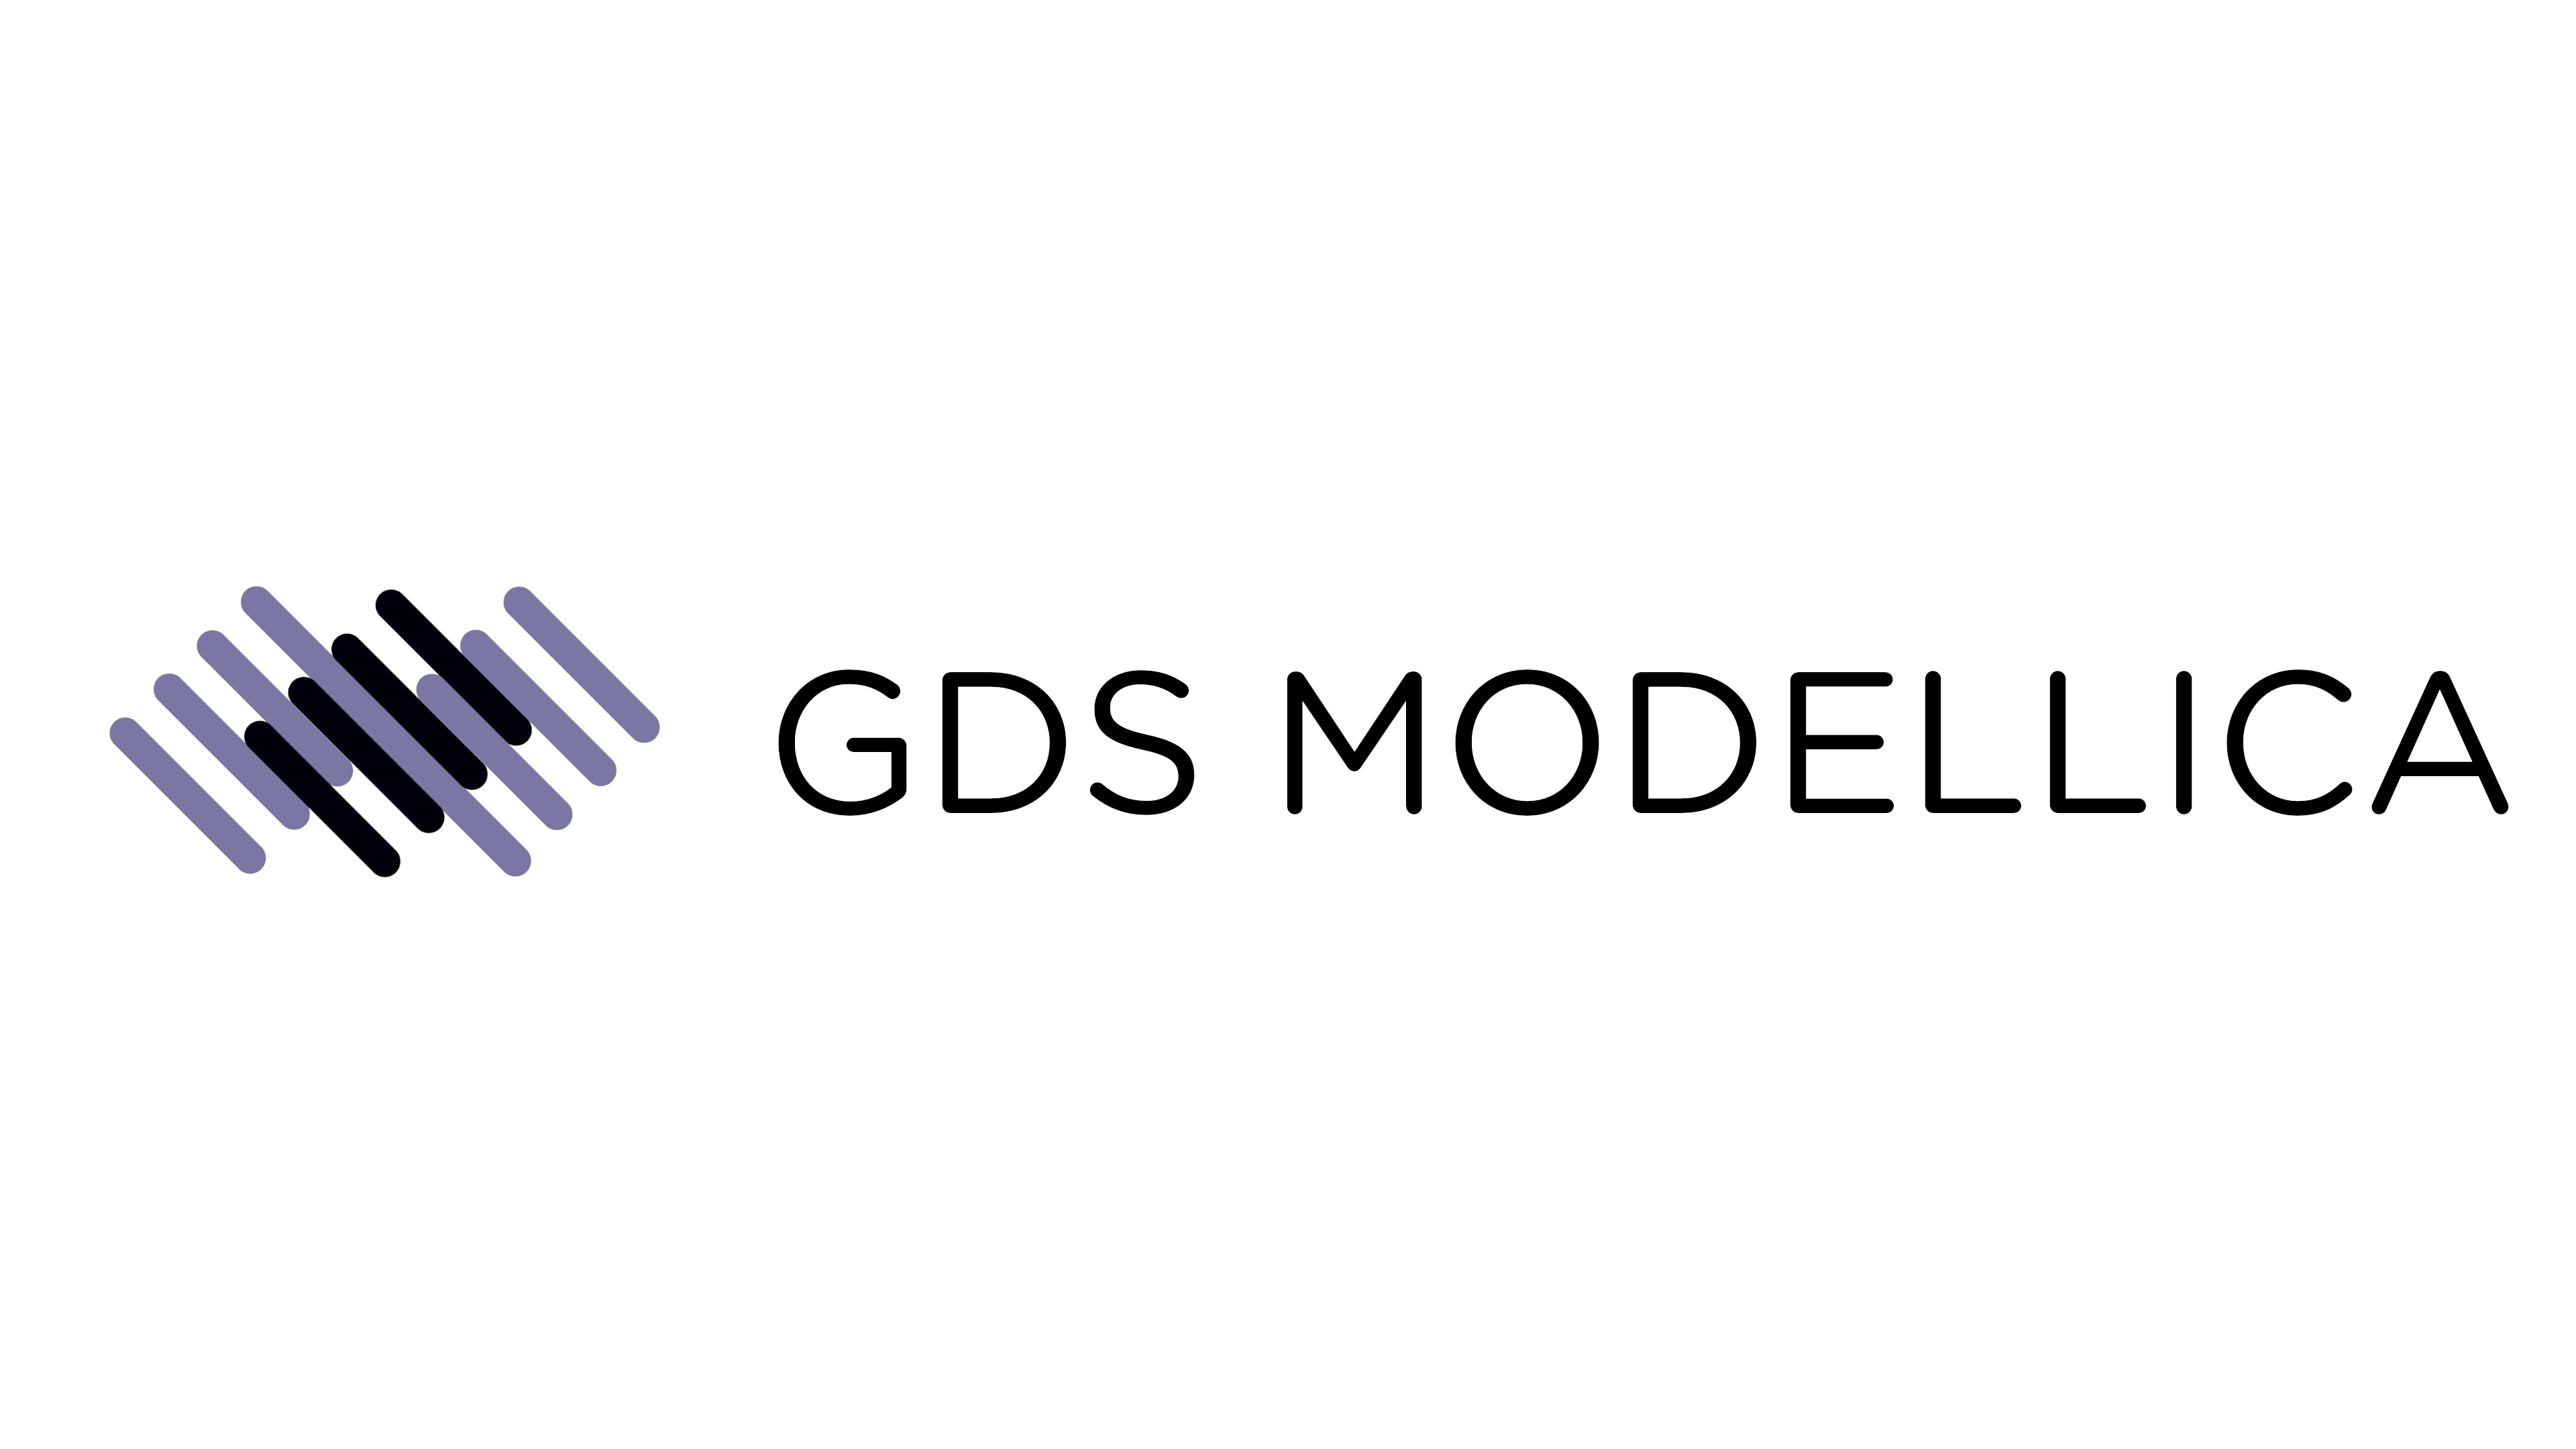 Decálogo del Digital Banking para usuarios según GDS Modellica